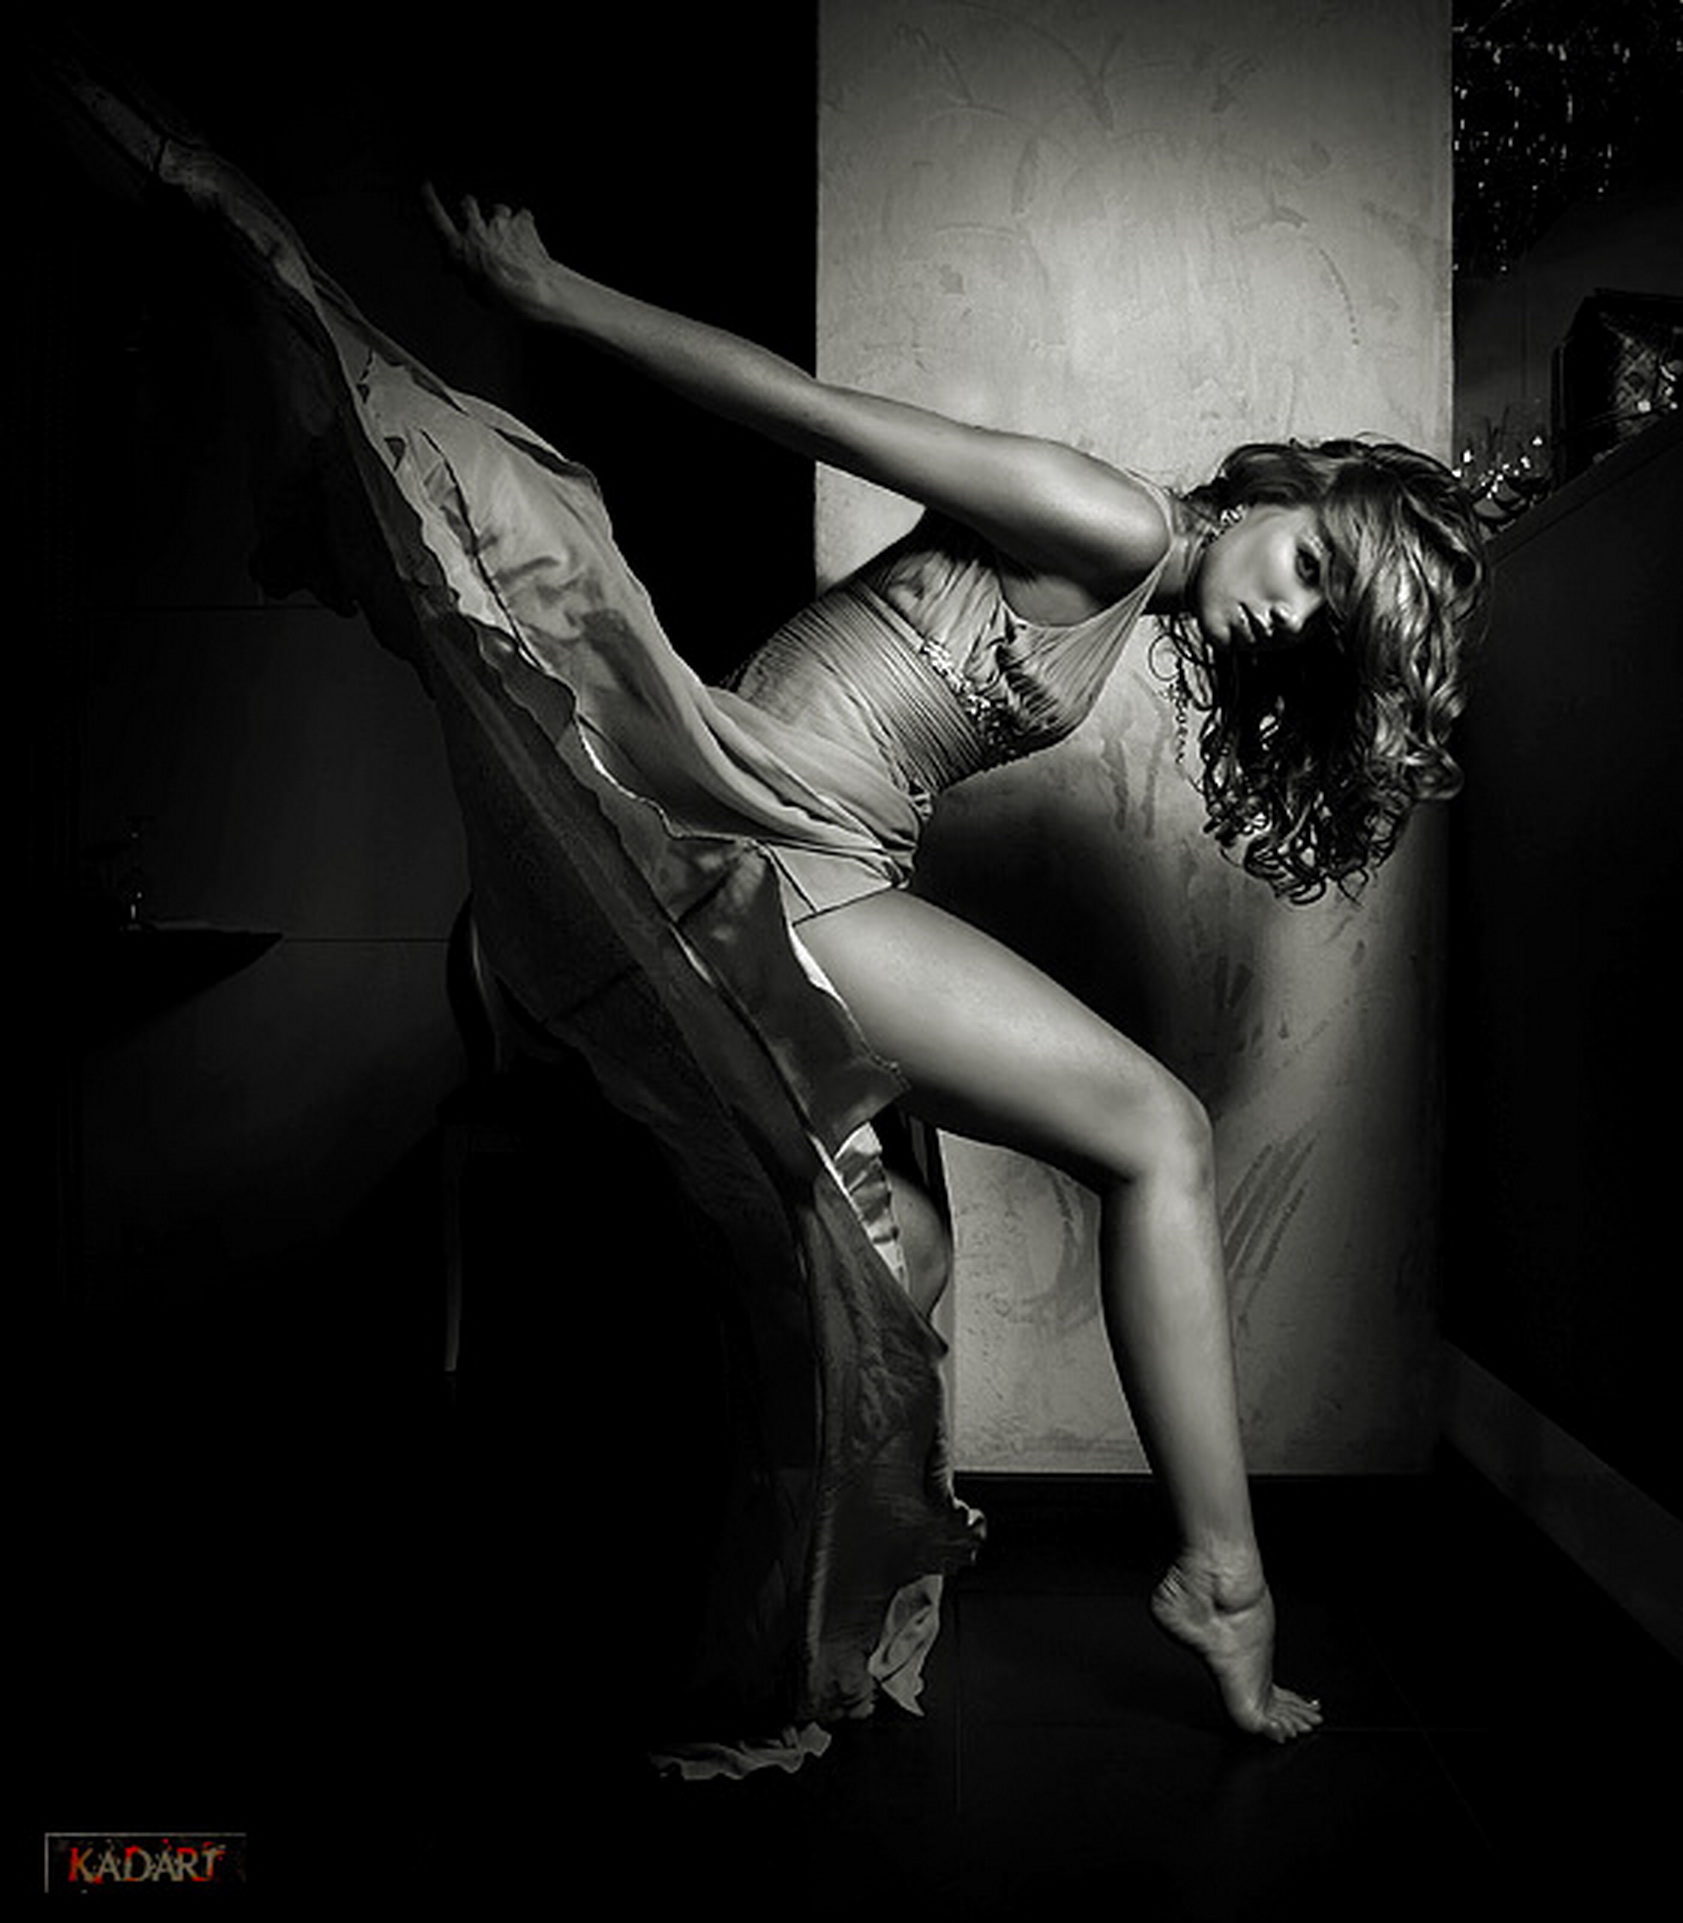 foto-erotika-professionalno